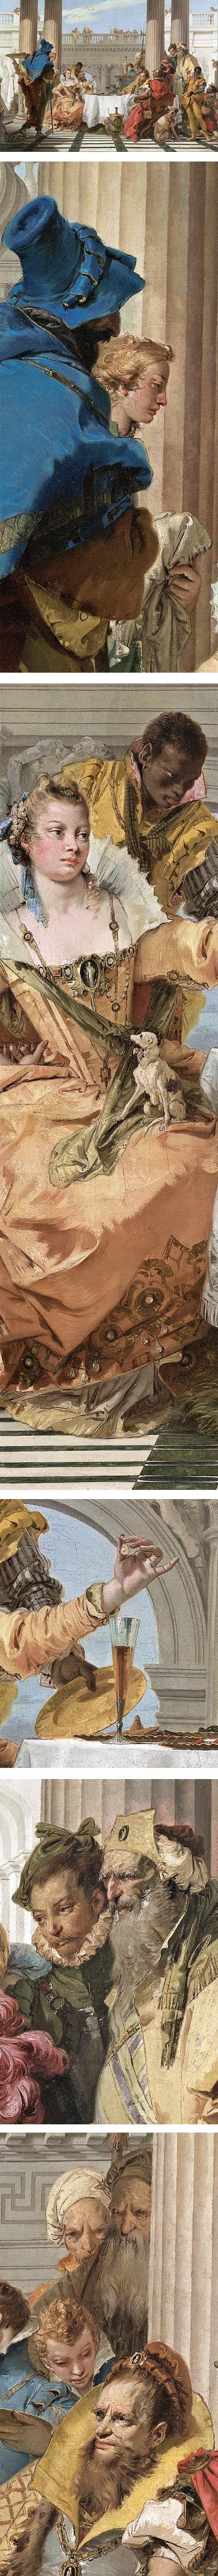 The Banquet of Cleopatra, Giambattista Tiepolo